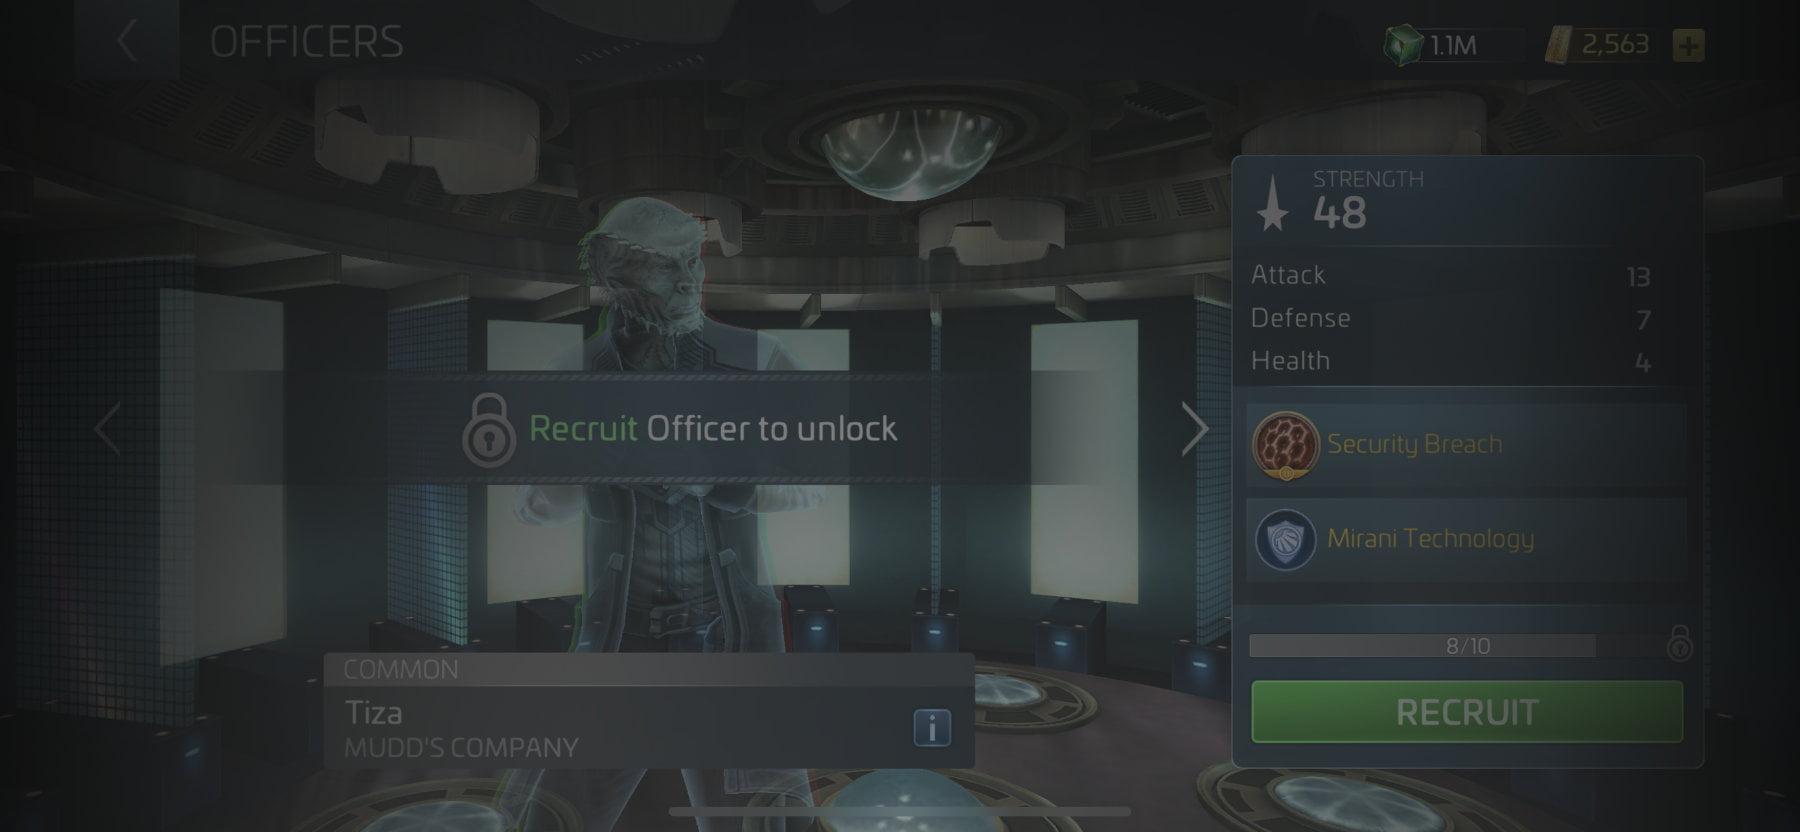 Officer Tiza